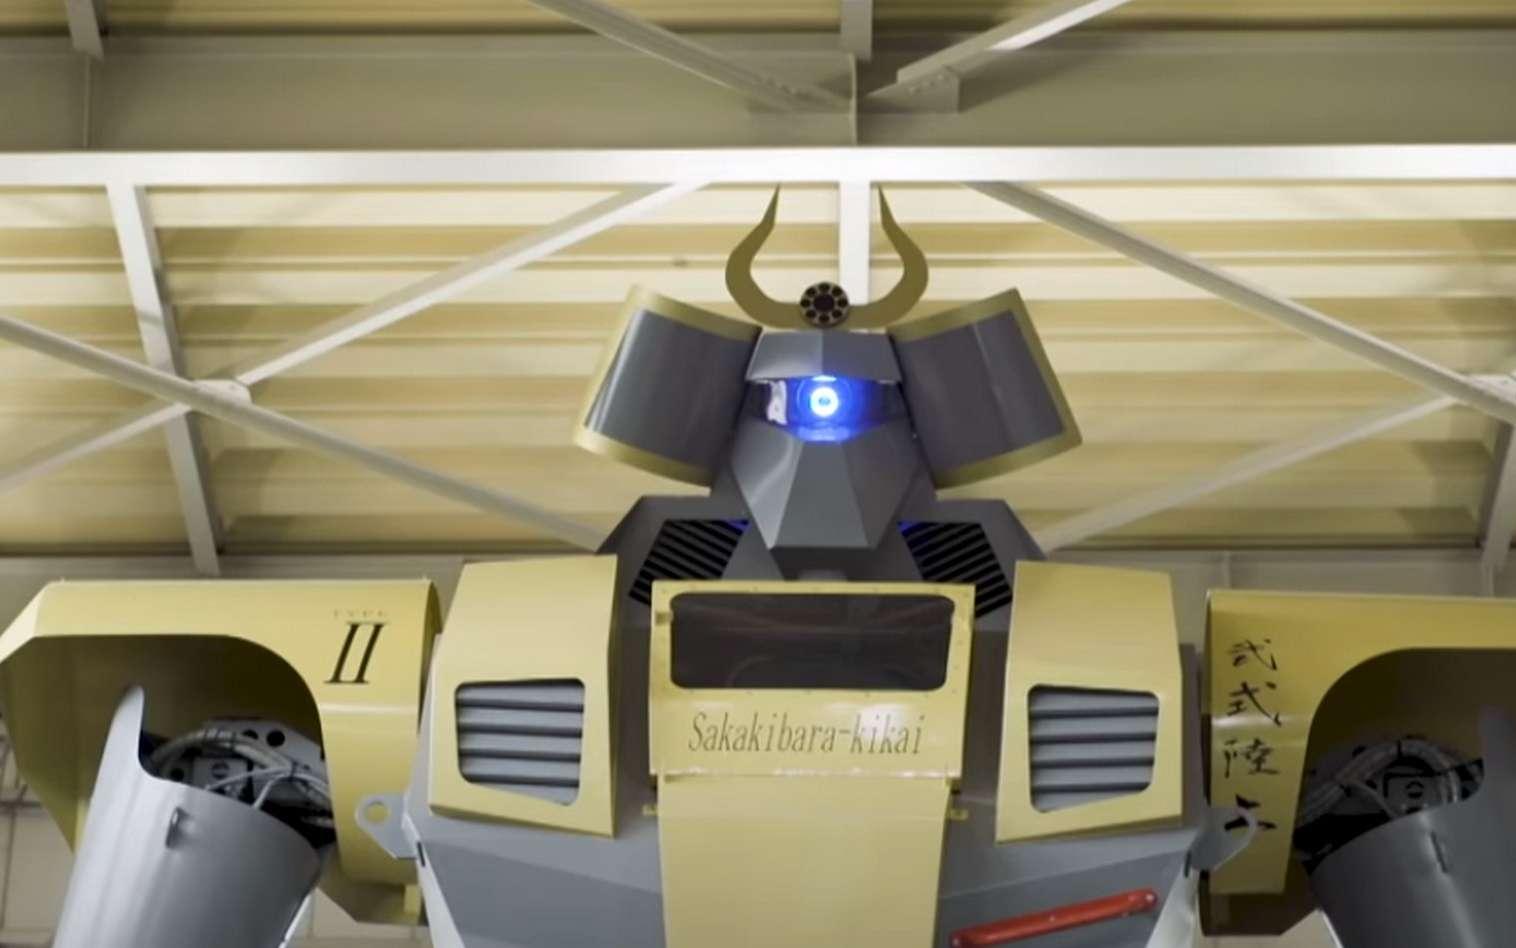 Le robot géant LW Mononofu de Masaaki Nagumo. © Great Big Story